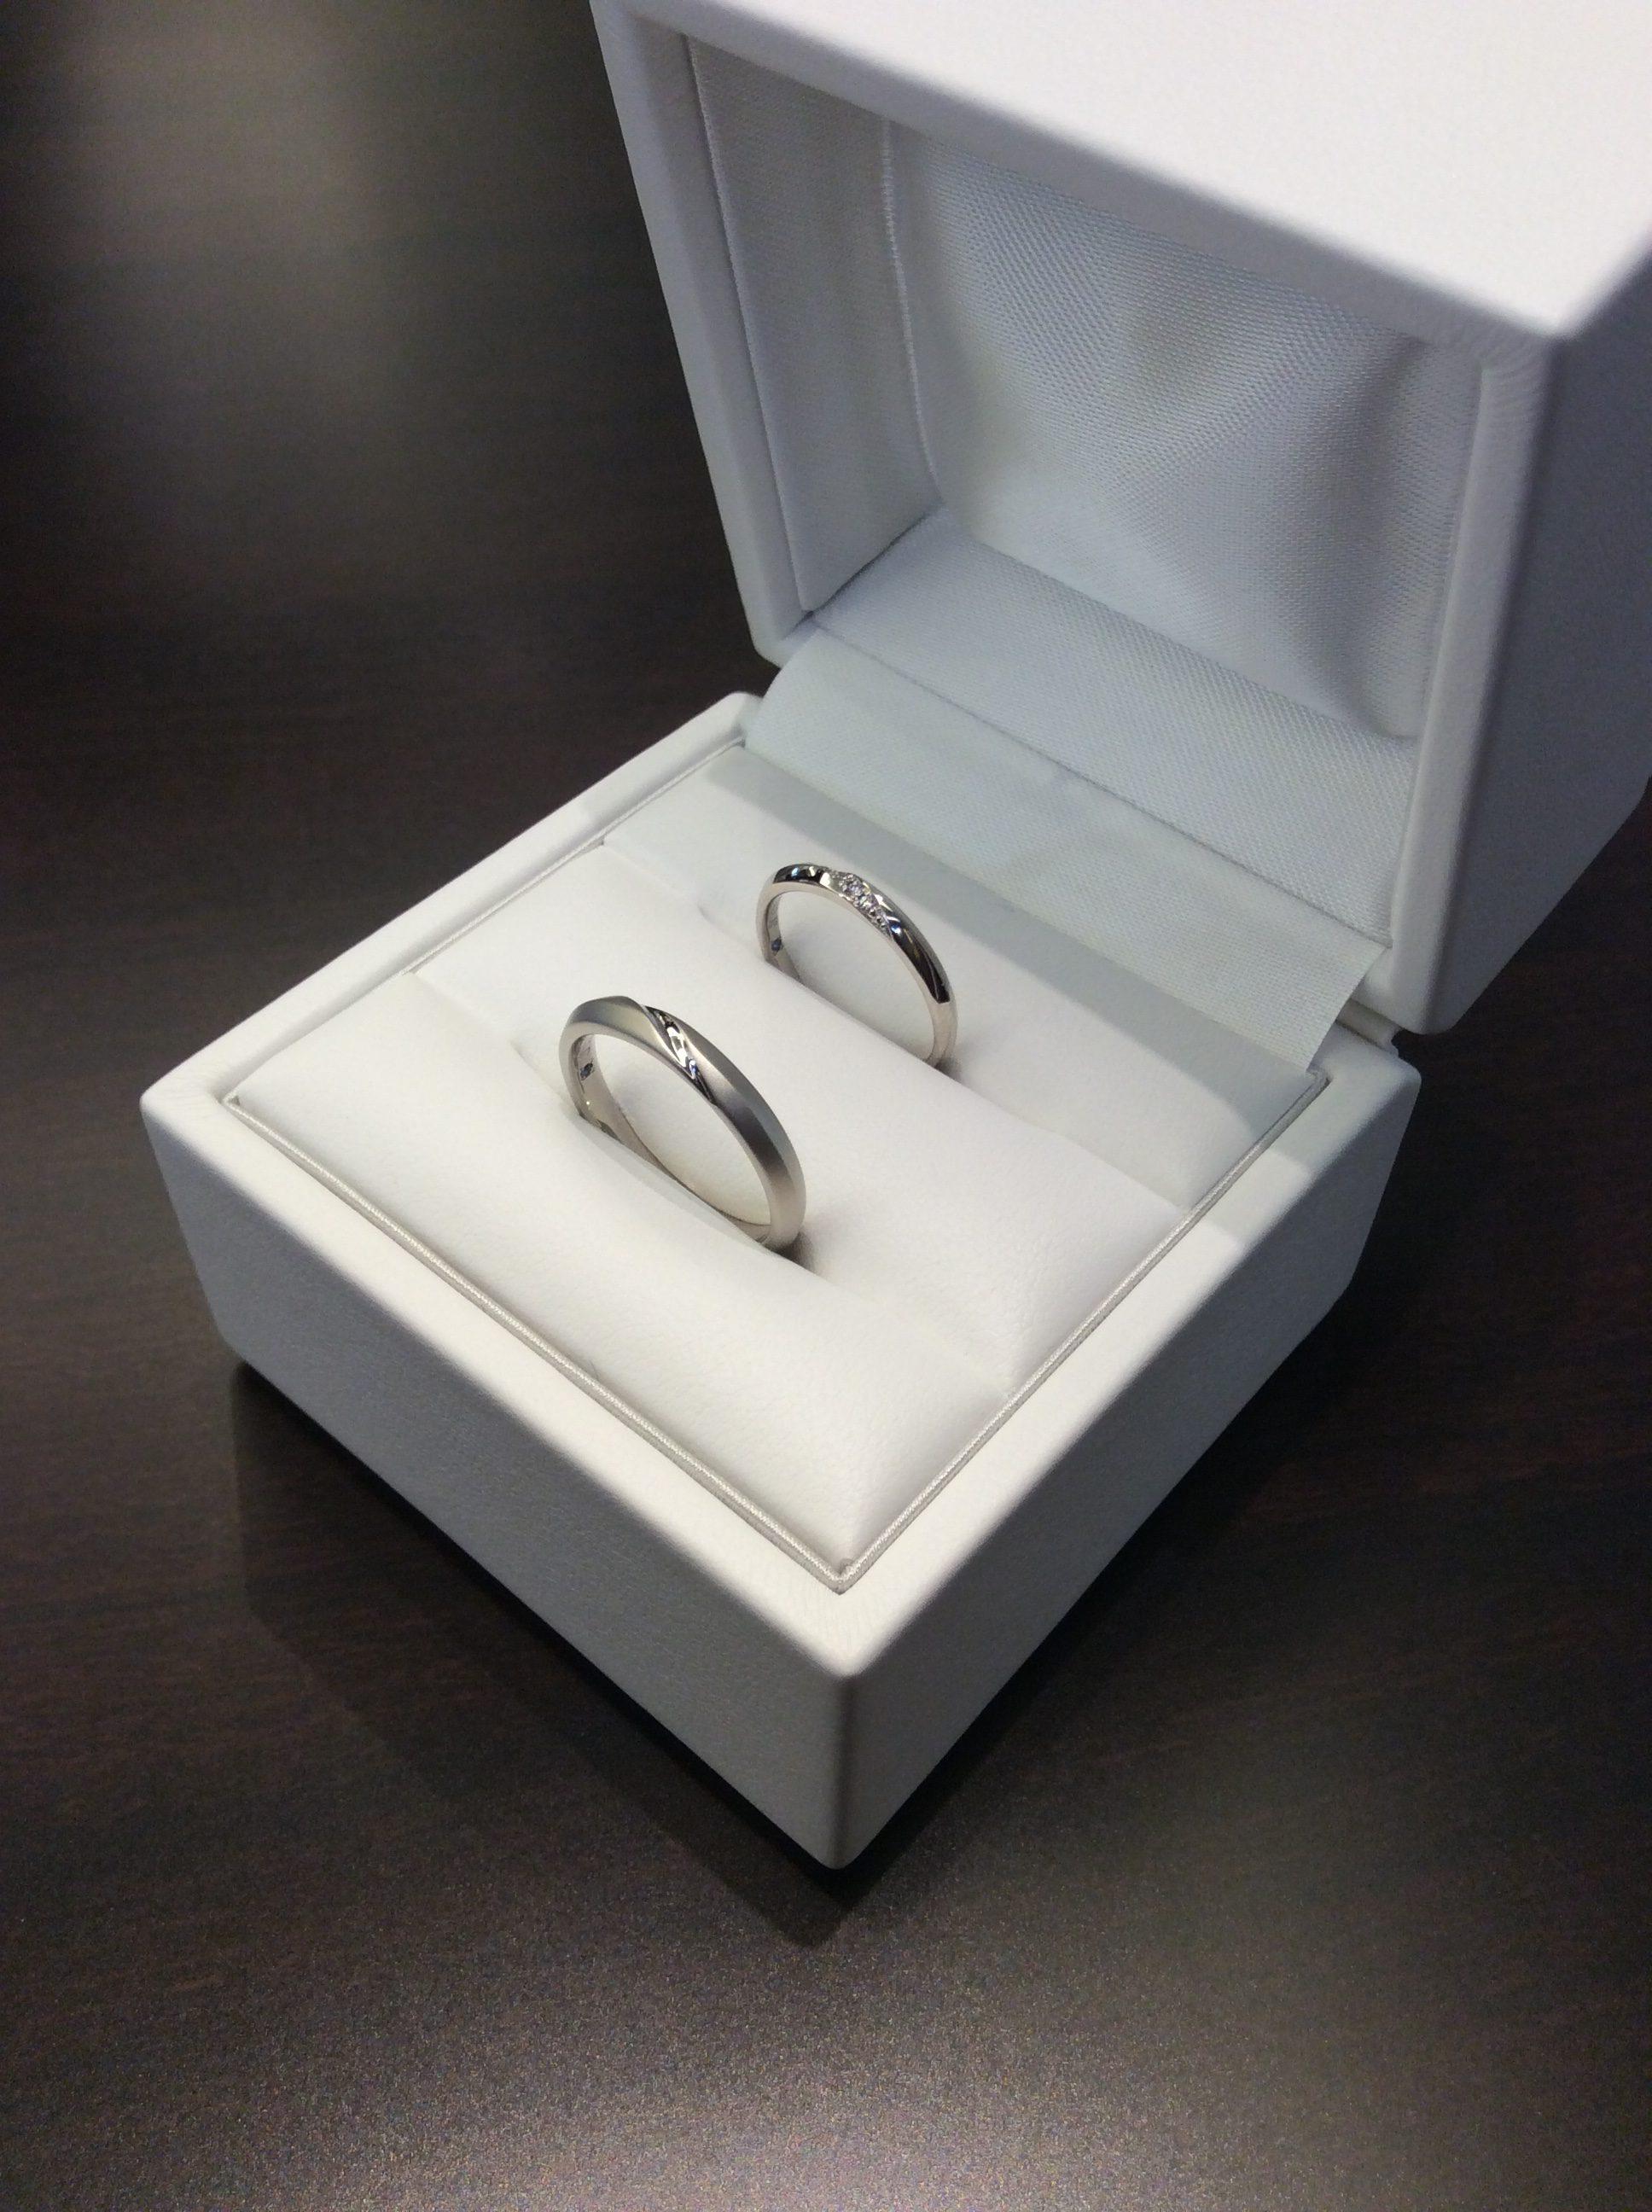 Cafe Ring(カフェリング)の結婚指輪『リュミエール』(新潟市/中嶋太一様・寛子様ご夫婦)